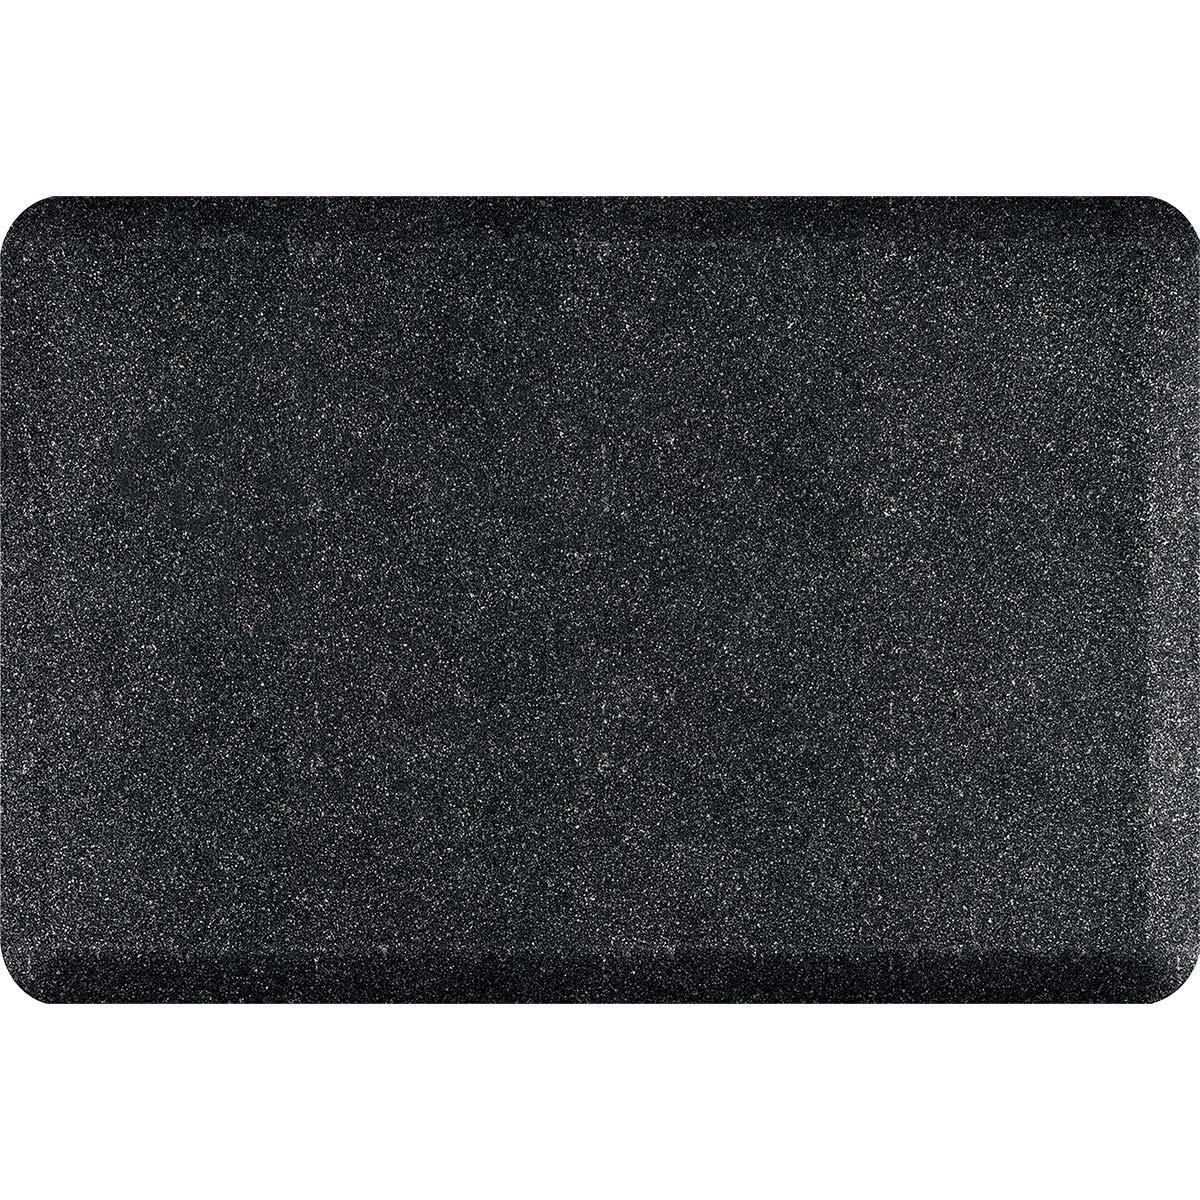 WellnessMats Granite 3 ' x 2 ' – Graniteオニキス   B07B4564ZZ